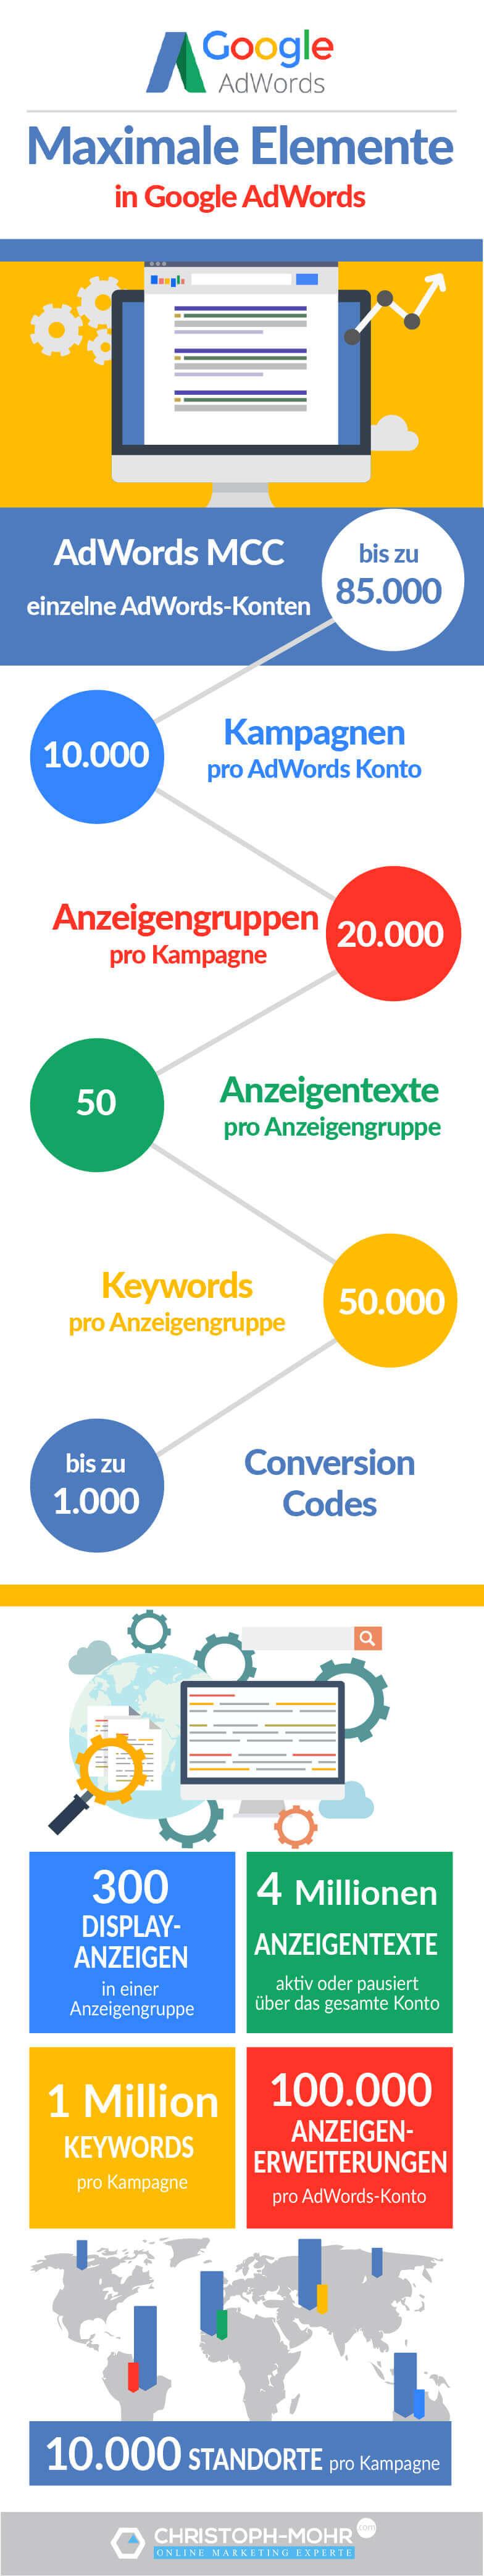 Infografik maximale AdWords Elemente - AdWords Begrenzung